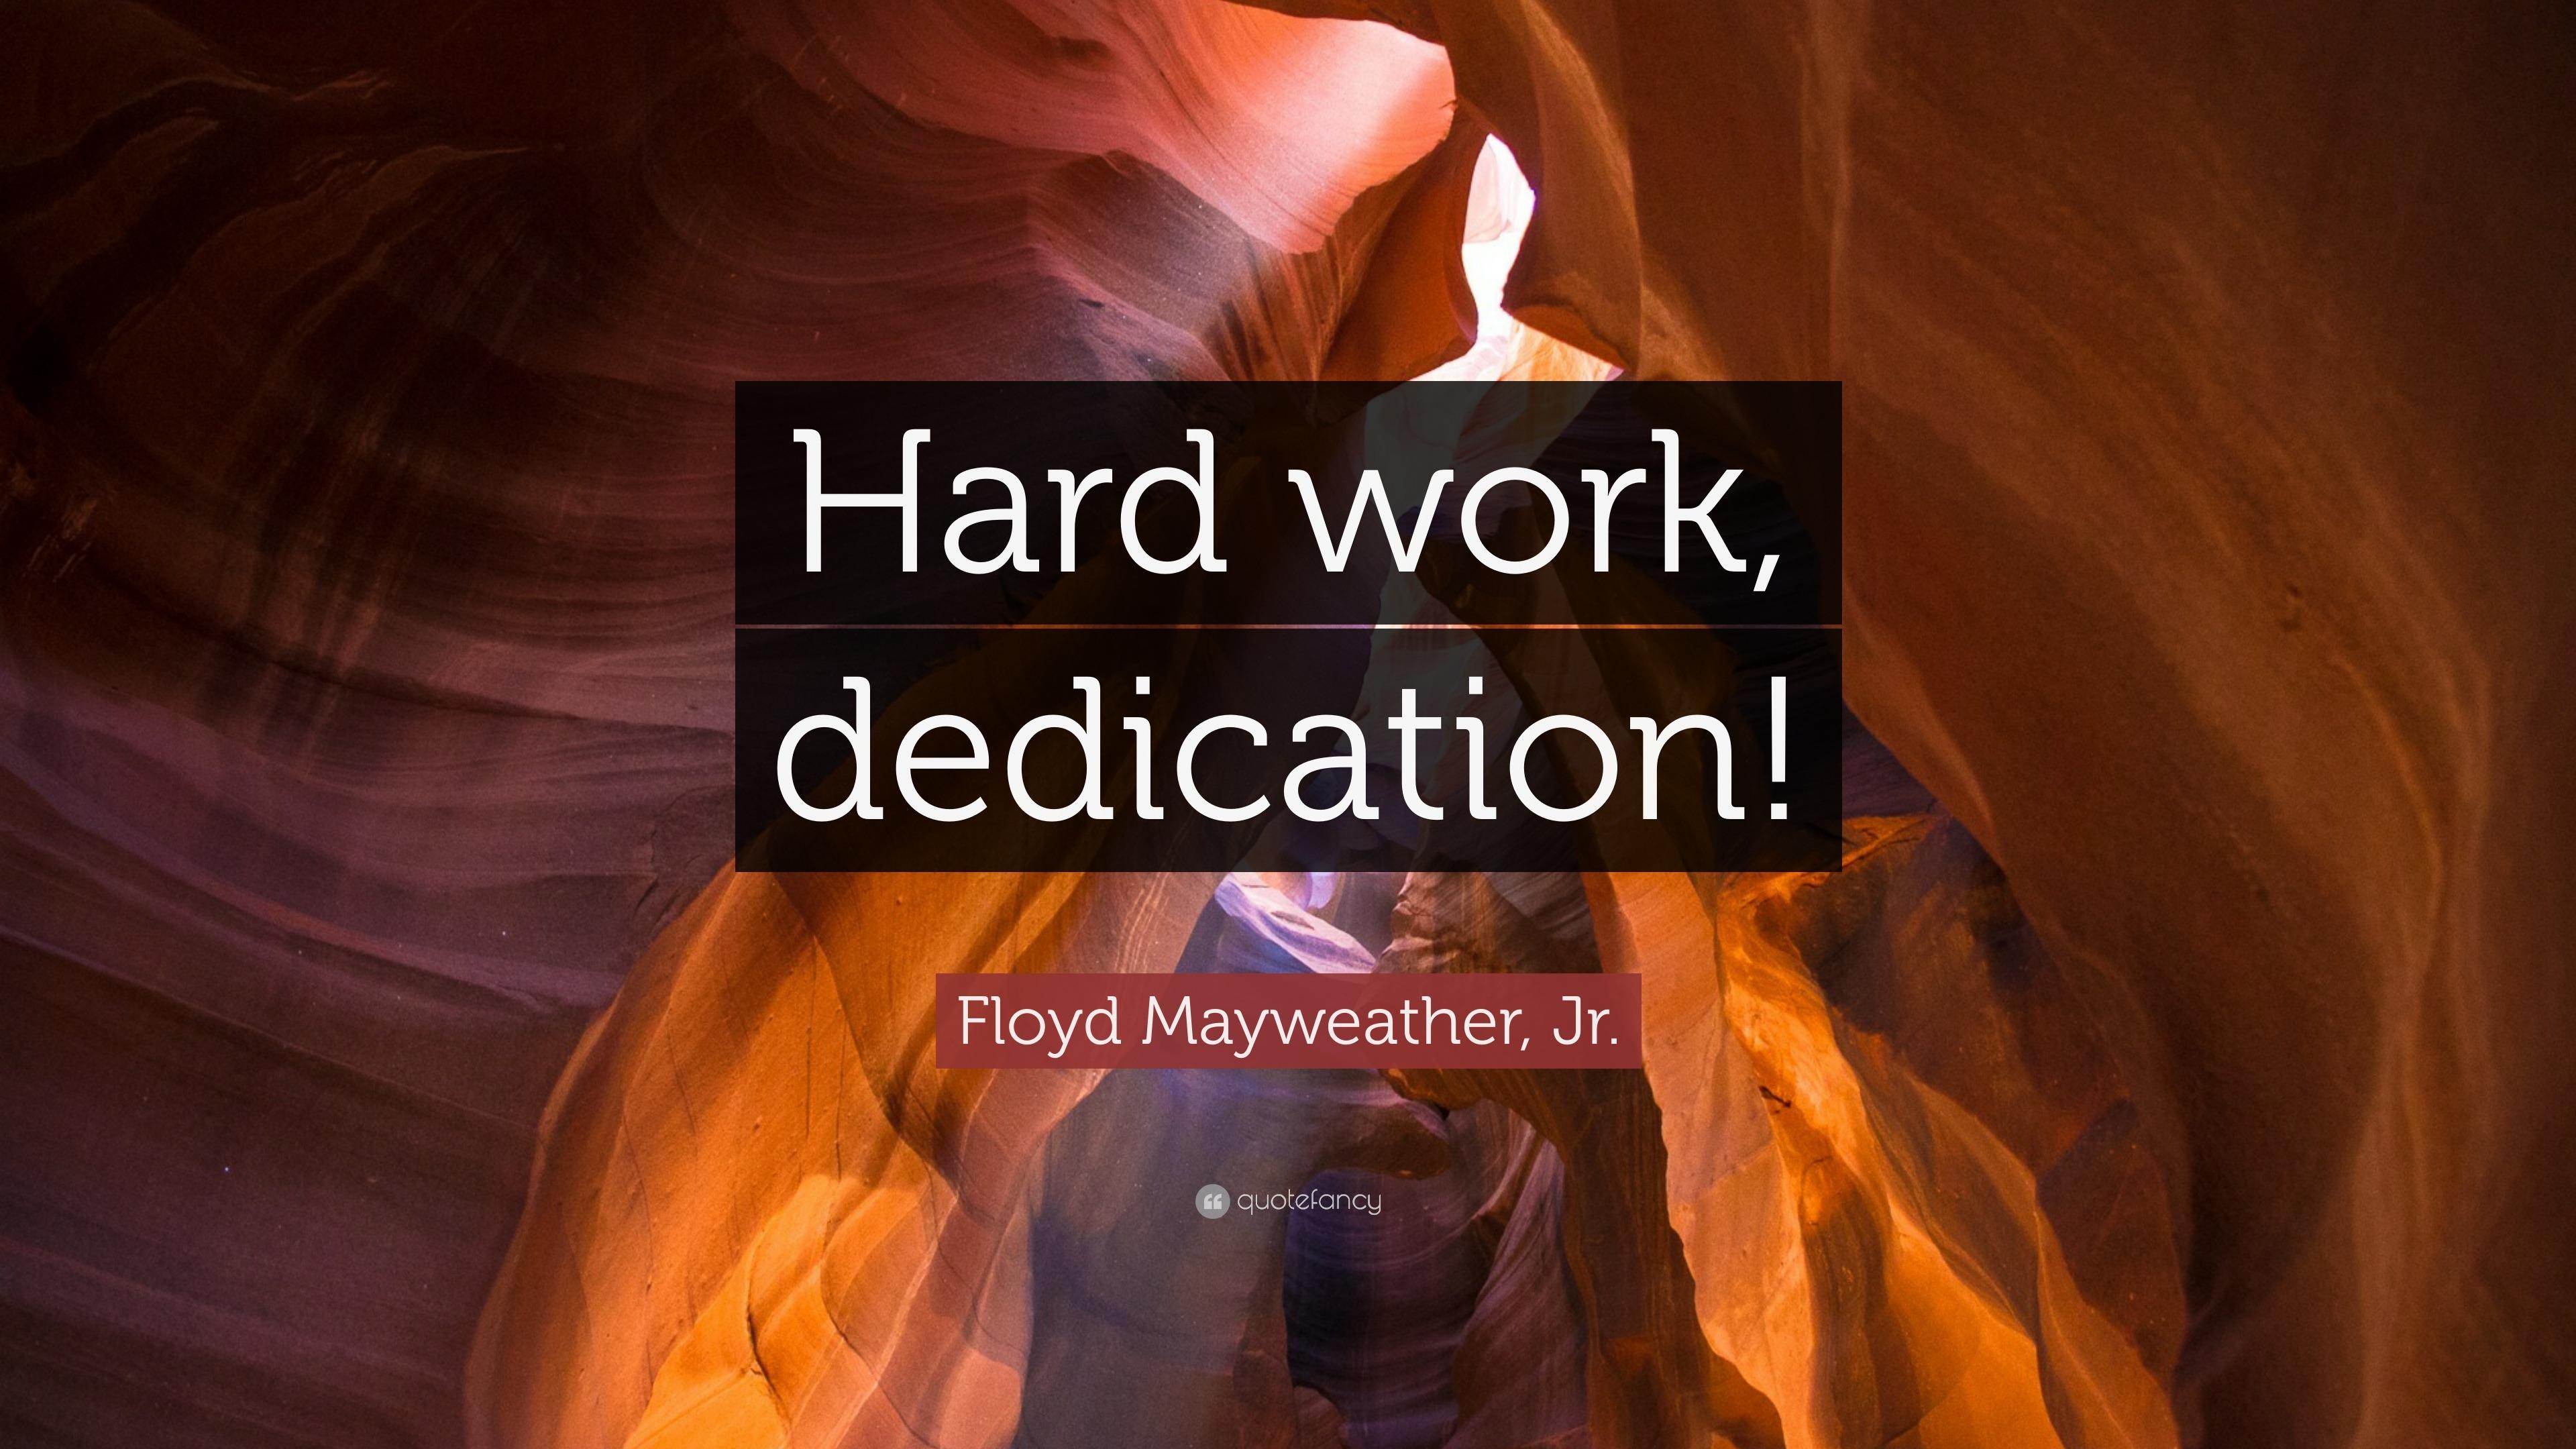 Floyd mayweather jr quote hard work dedication 12 floyd mayweather jr quote hard work dedication altavistaventures Images